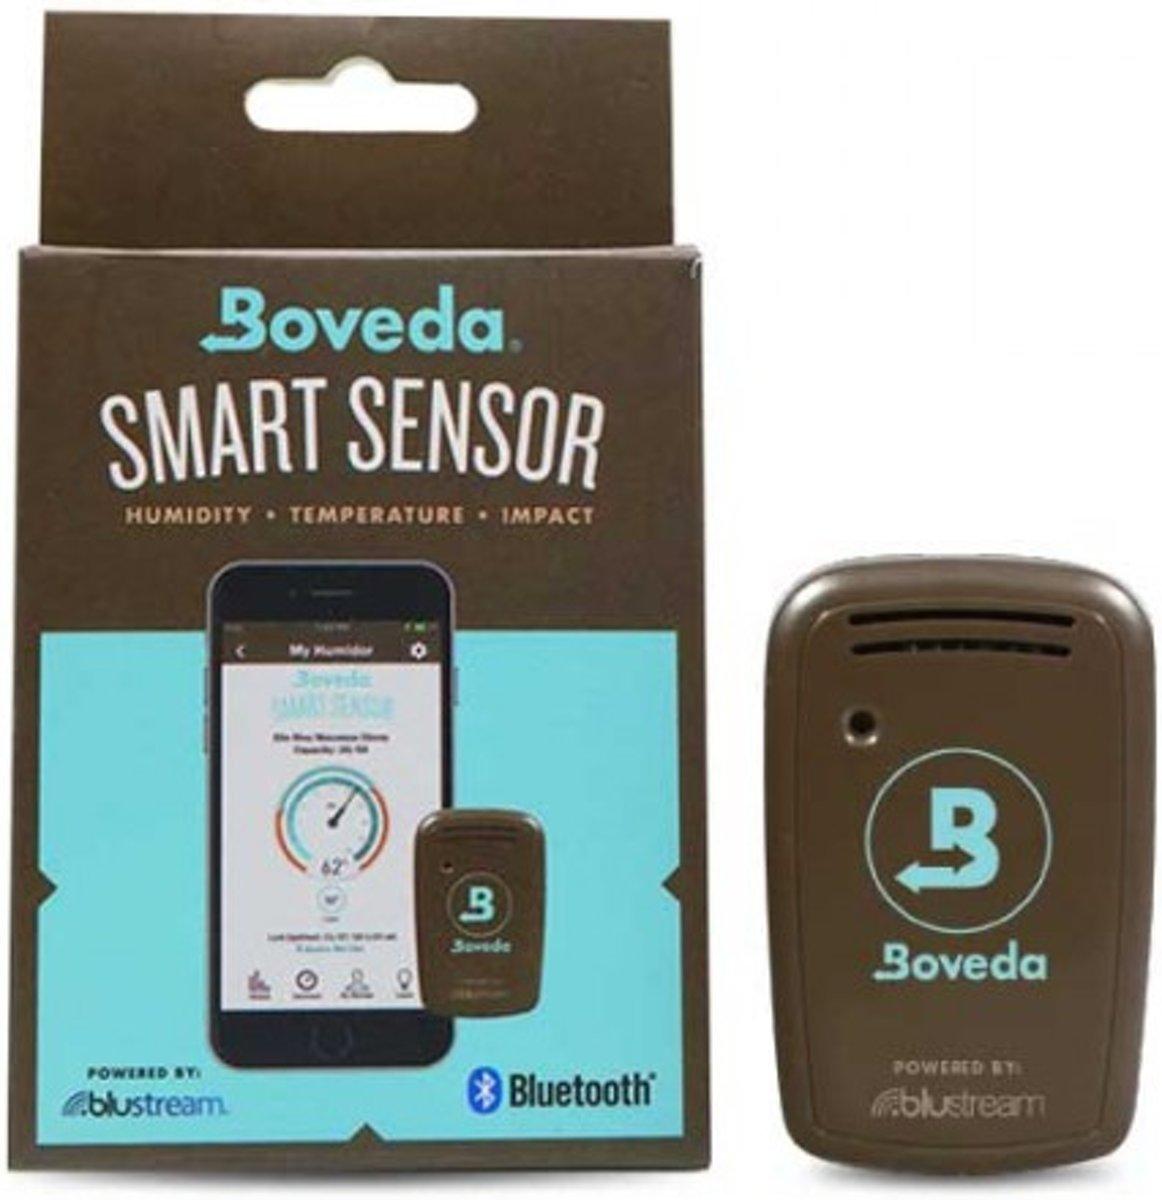 Boveda Digitale Hygrometer via smartphone